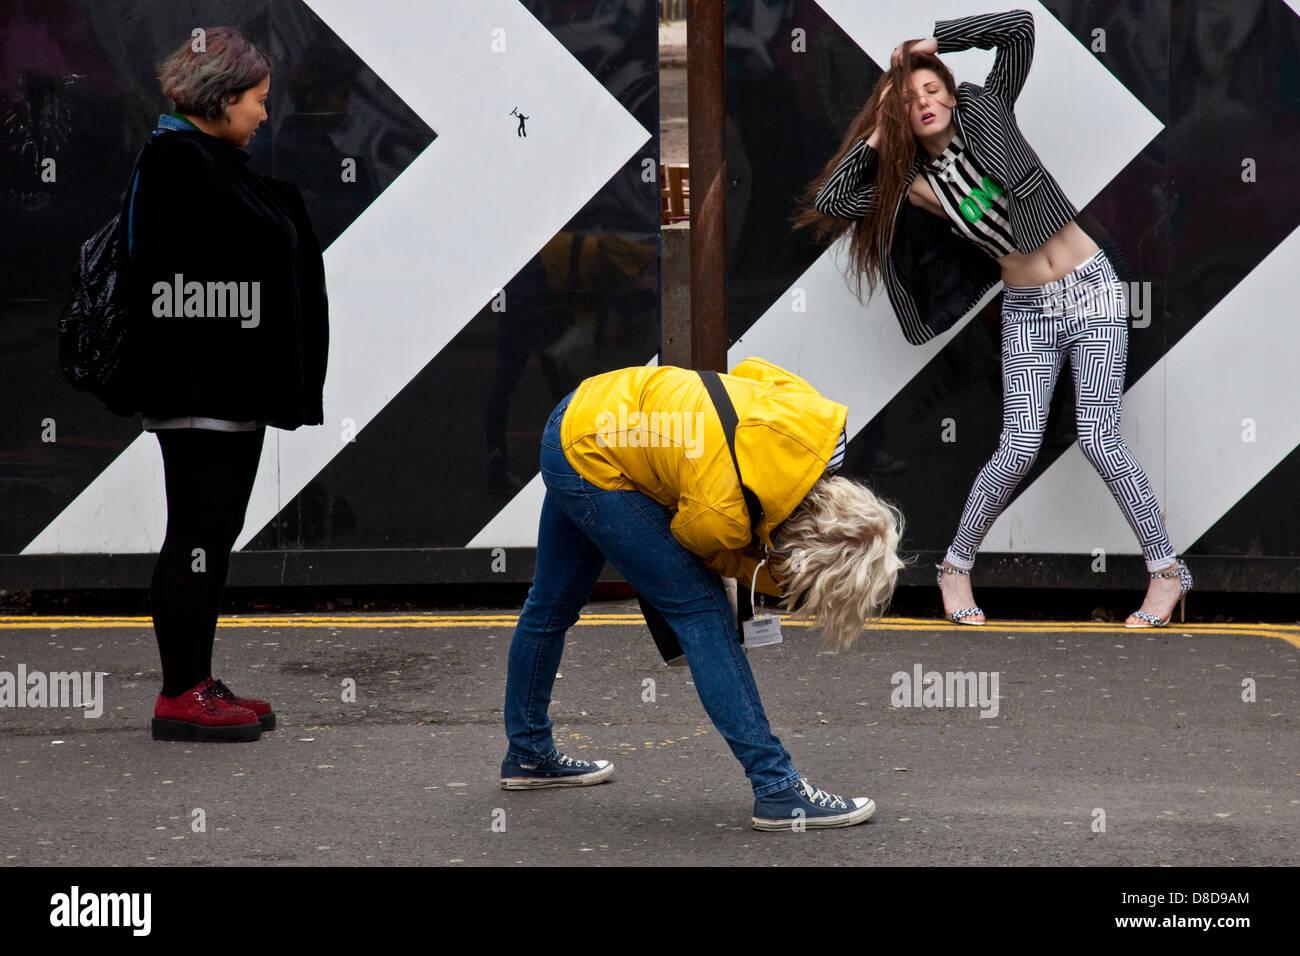 Photo Shoot, Brick Lane, London, England Stock Photo